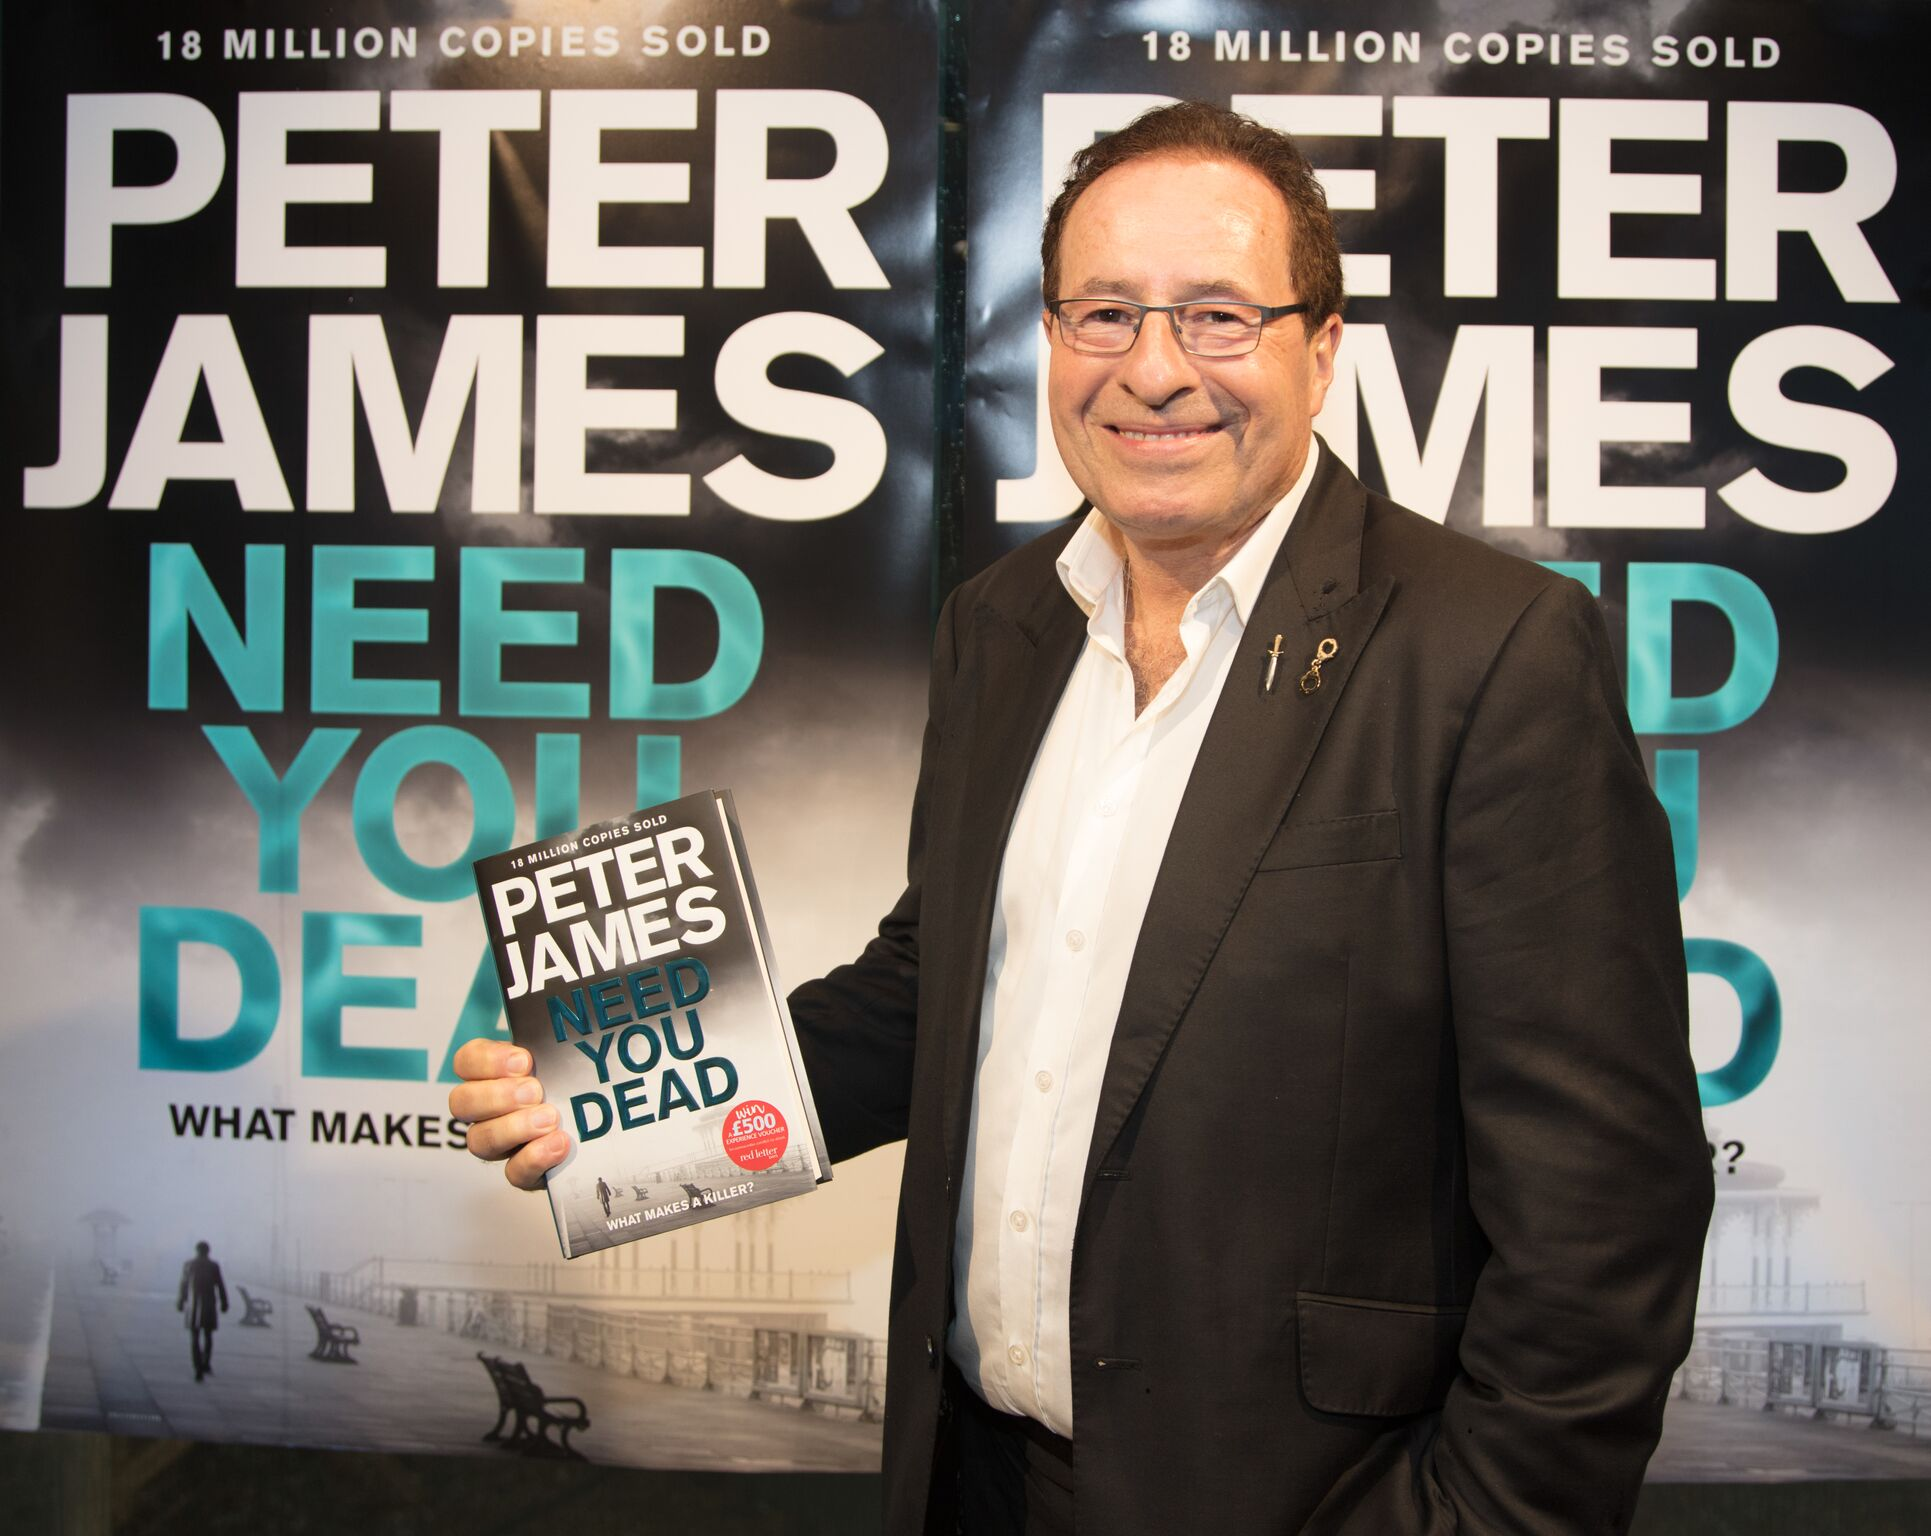 Peter james lansering.jpg